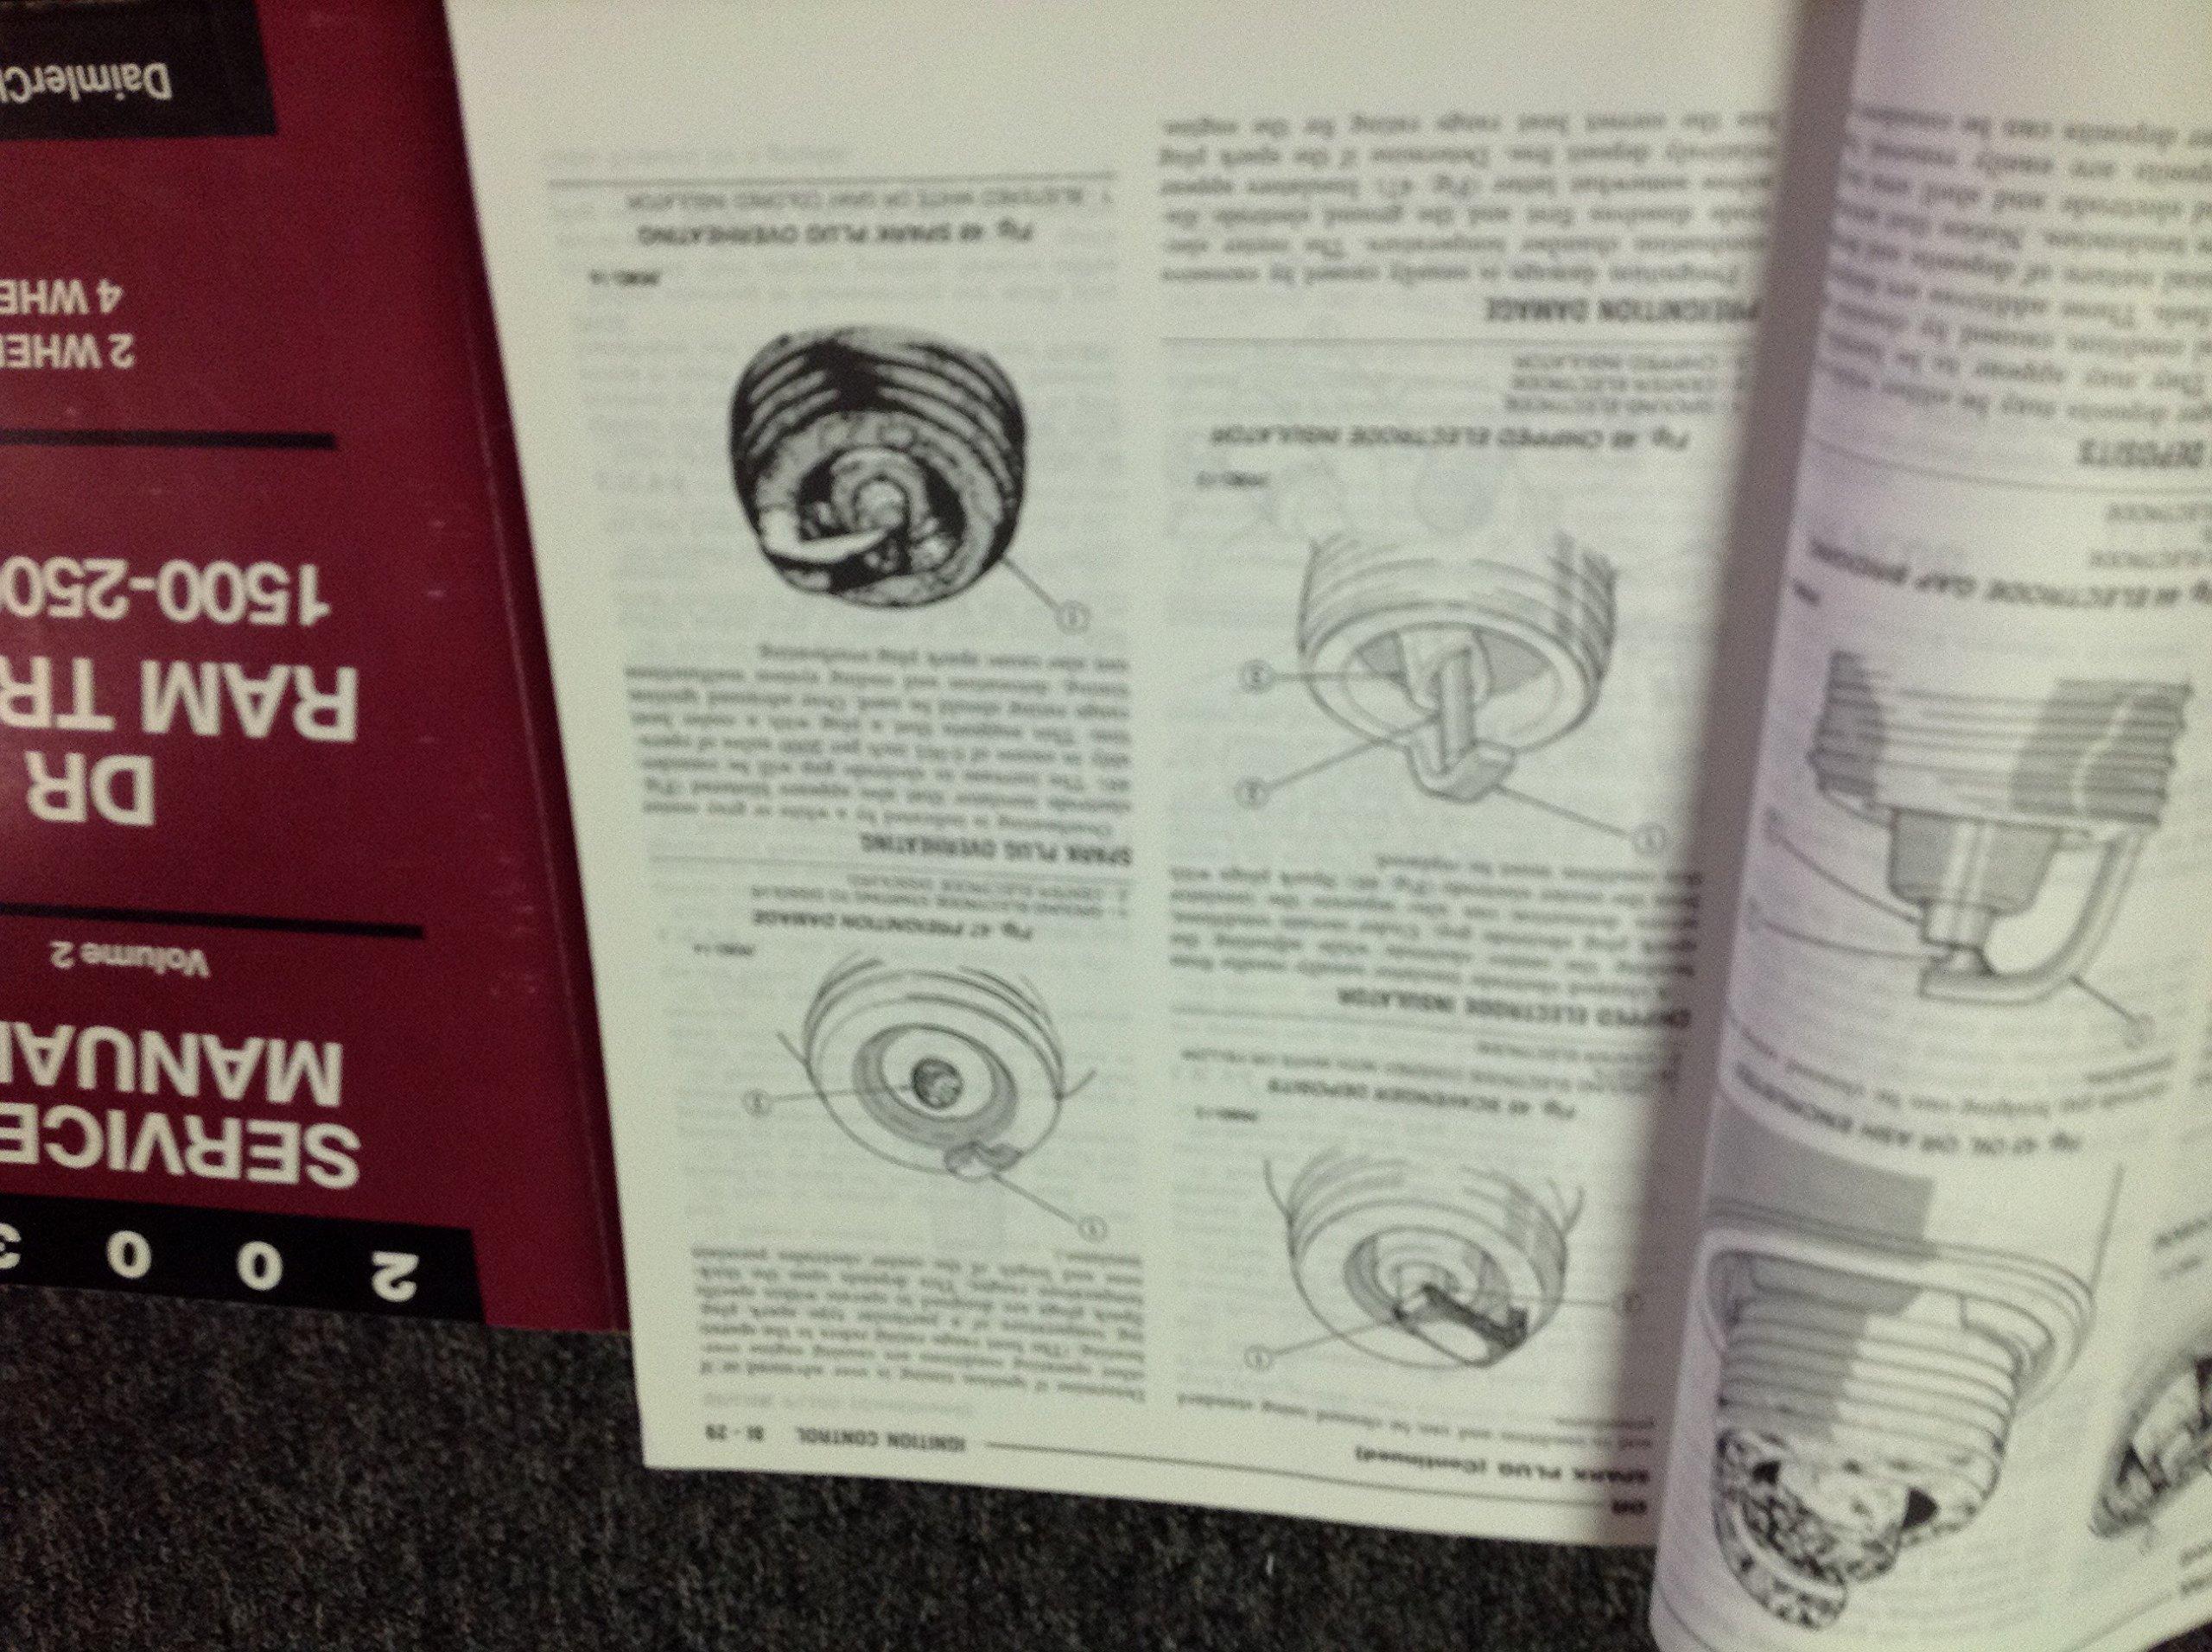 2003 DODGE RAM TRUCK 1500 2500 3500 Service Shop Repair Manual Set W Labor  Guide & Diagnostics: DODGE: Amazon.com: Books